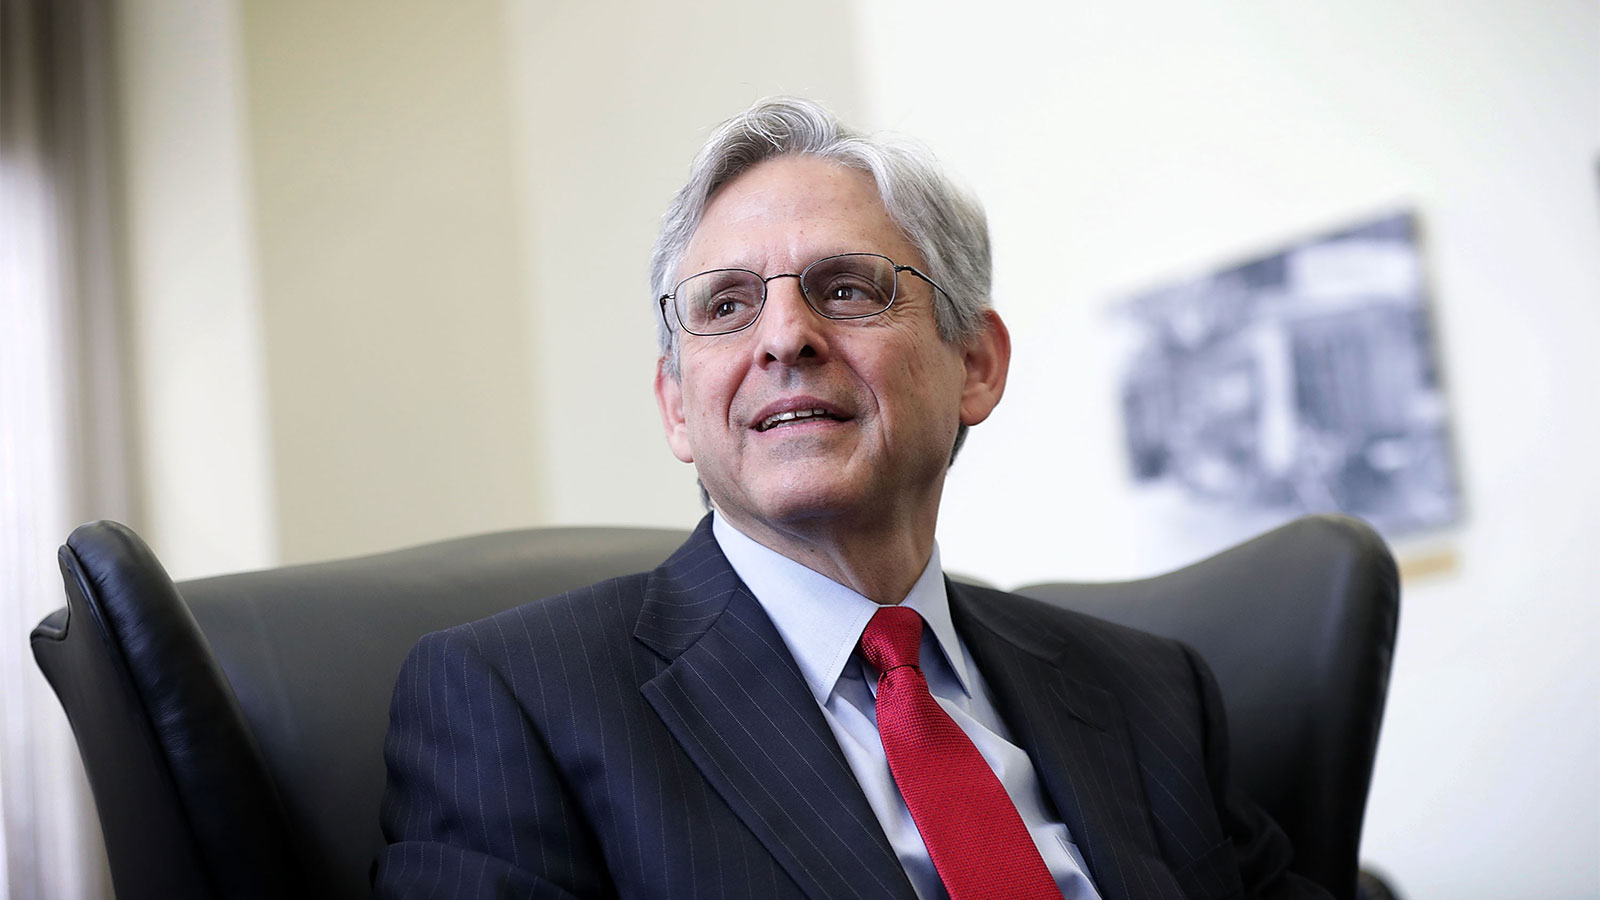 Supreme Court nominee Merrick Garland